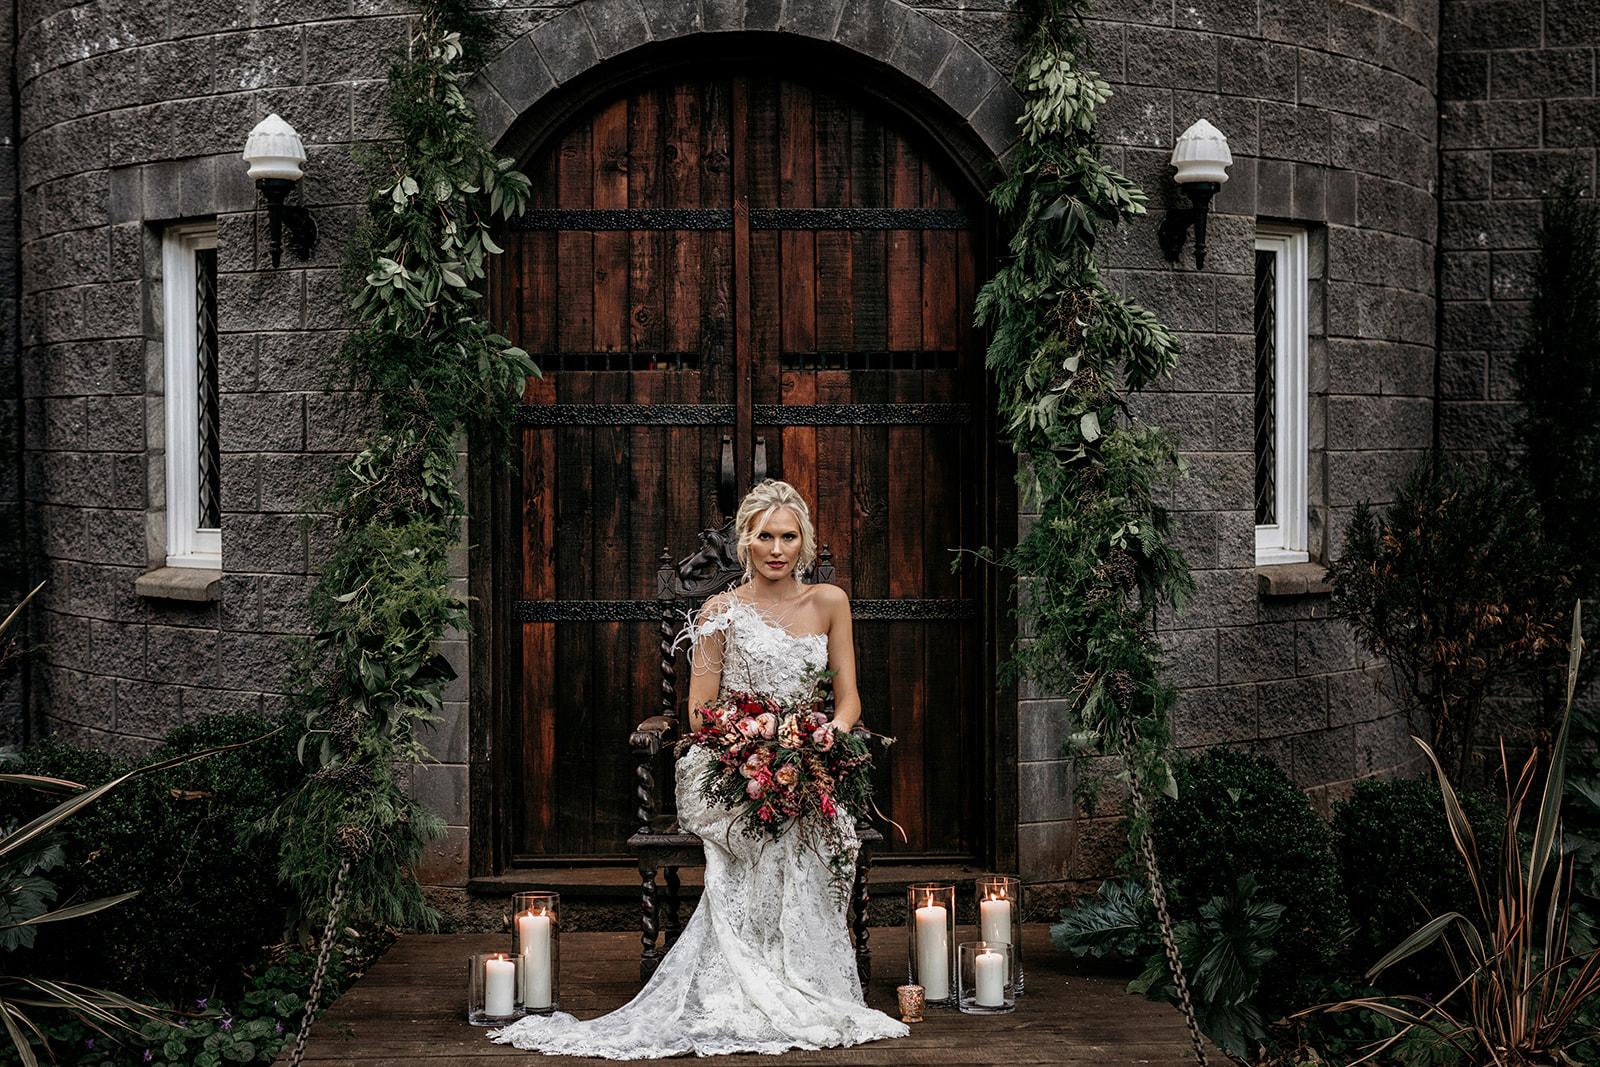 bridal-designer-gold-coast-brisbane-helena-couture-designs14.jpg